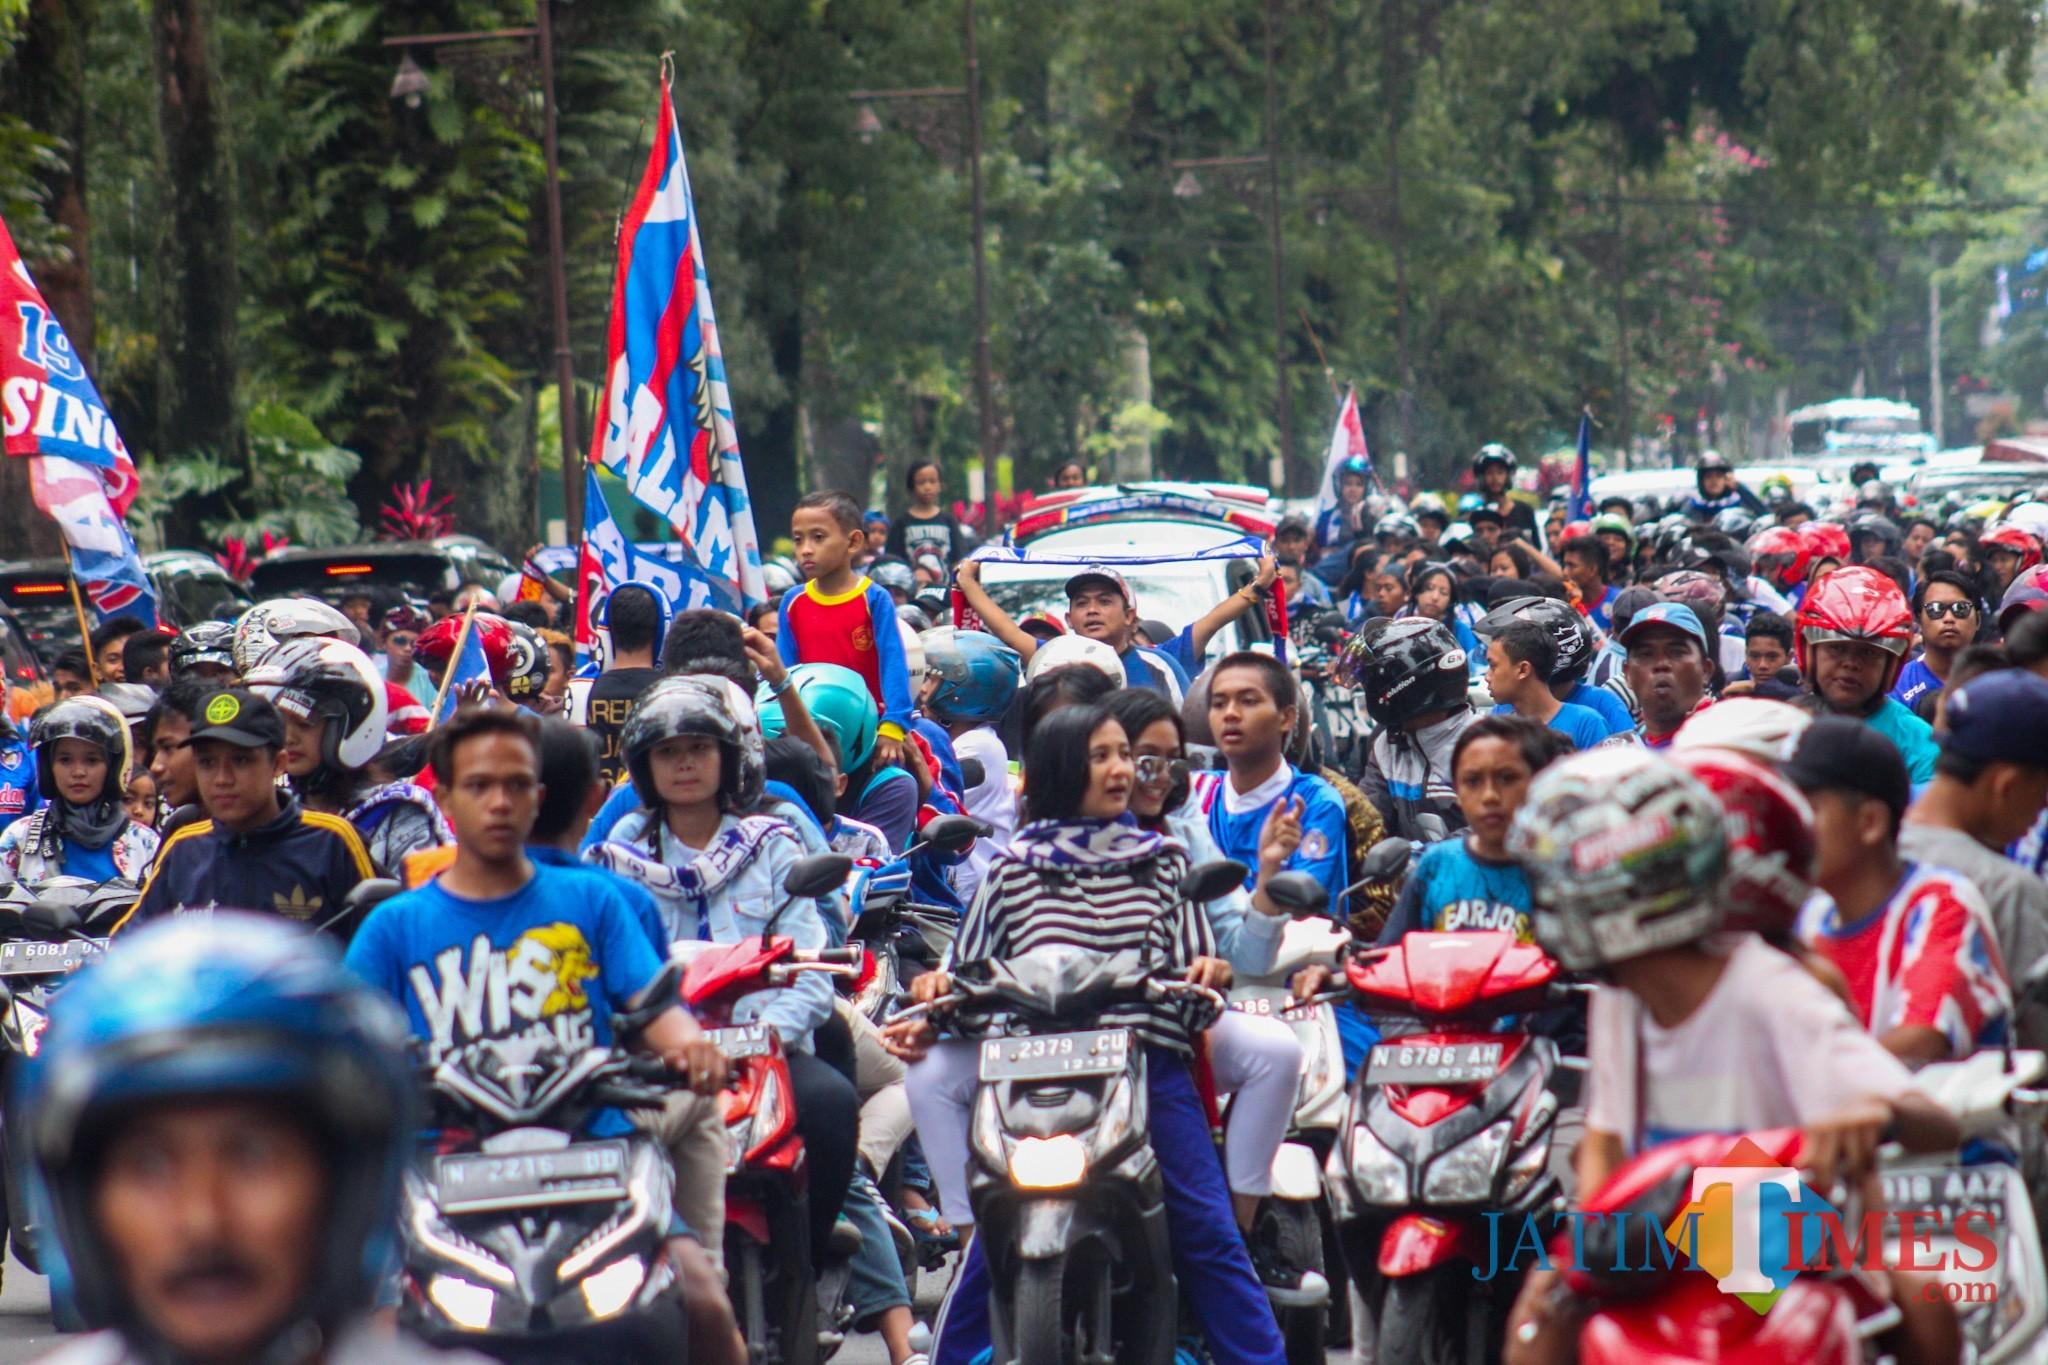 Supporter Arema pada saat berkonvoi di jalanan Kota Malang (Luqmanul Hakim/Malang Times)